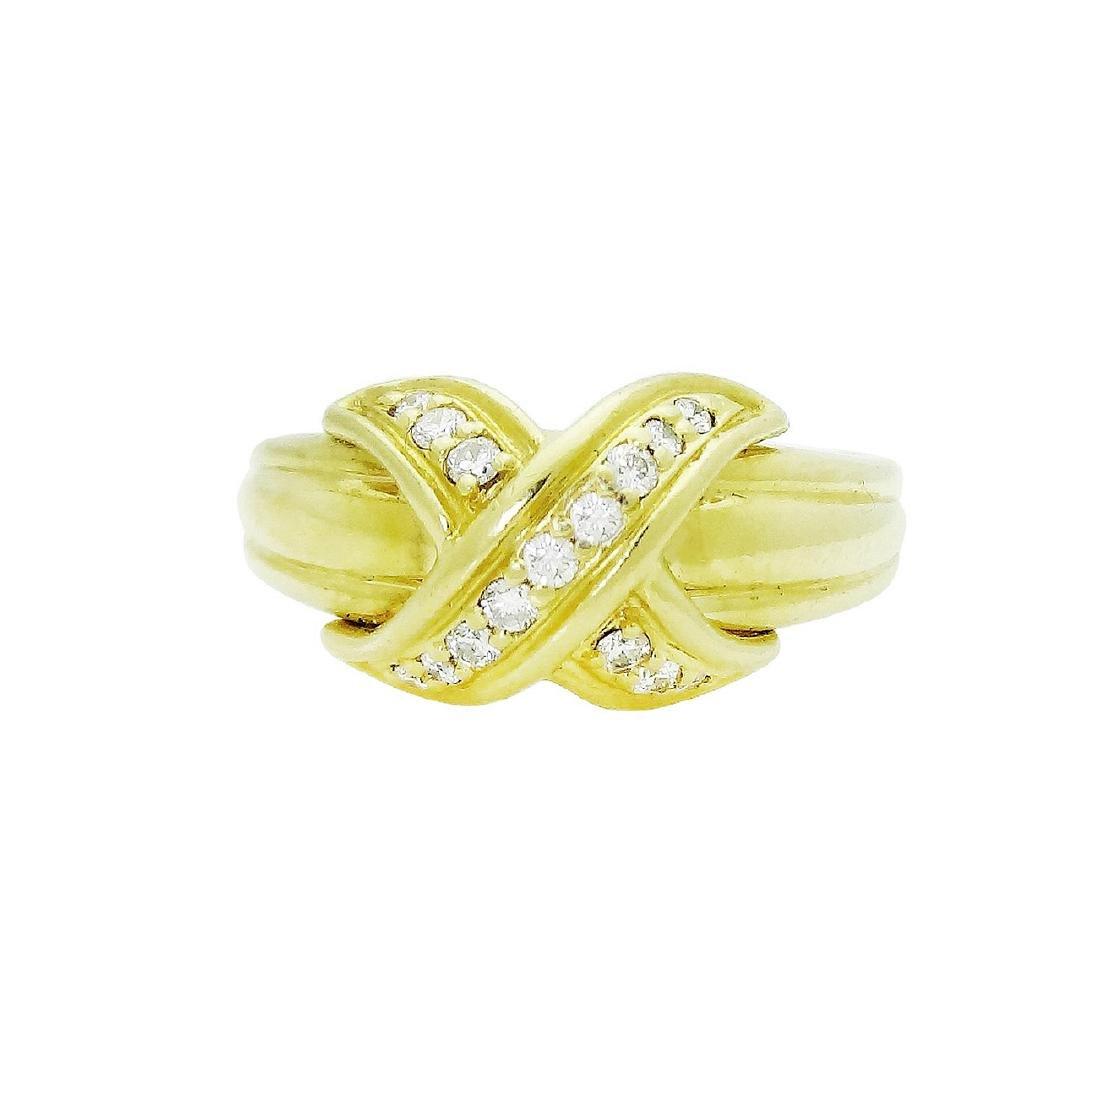 Tiffany & Co. 18K Yellow Gold Signature X Diamond Ring